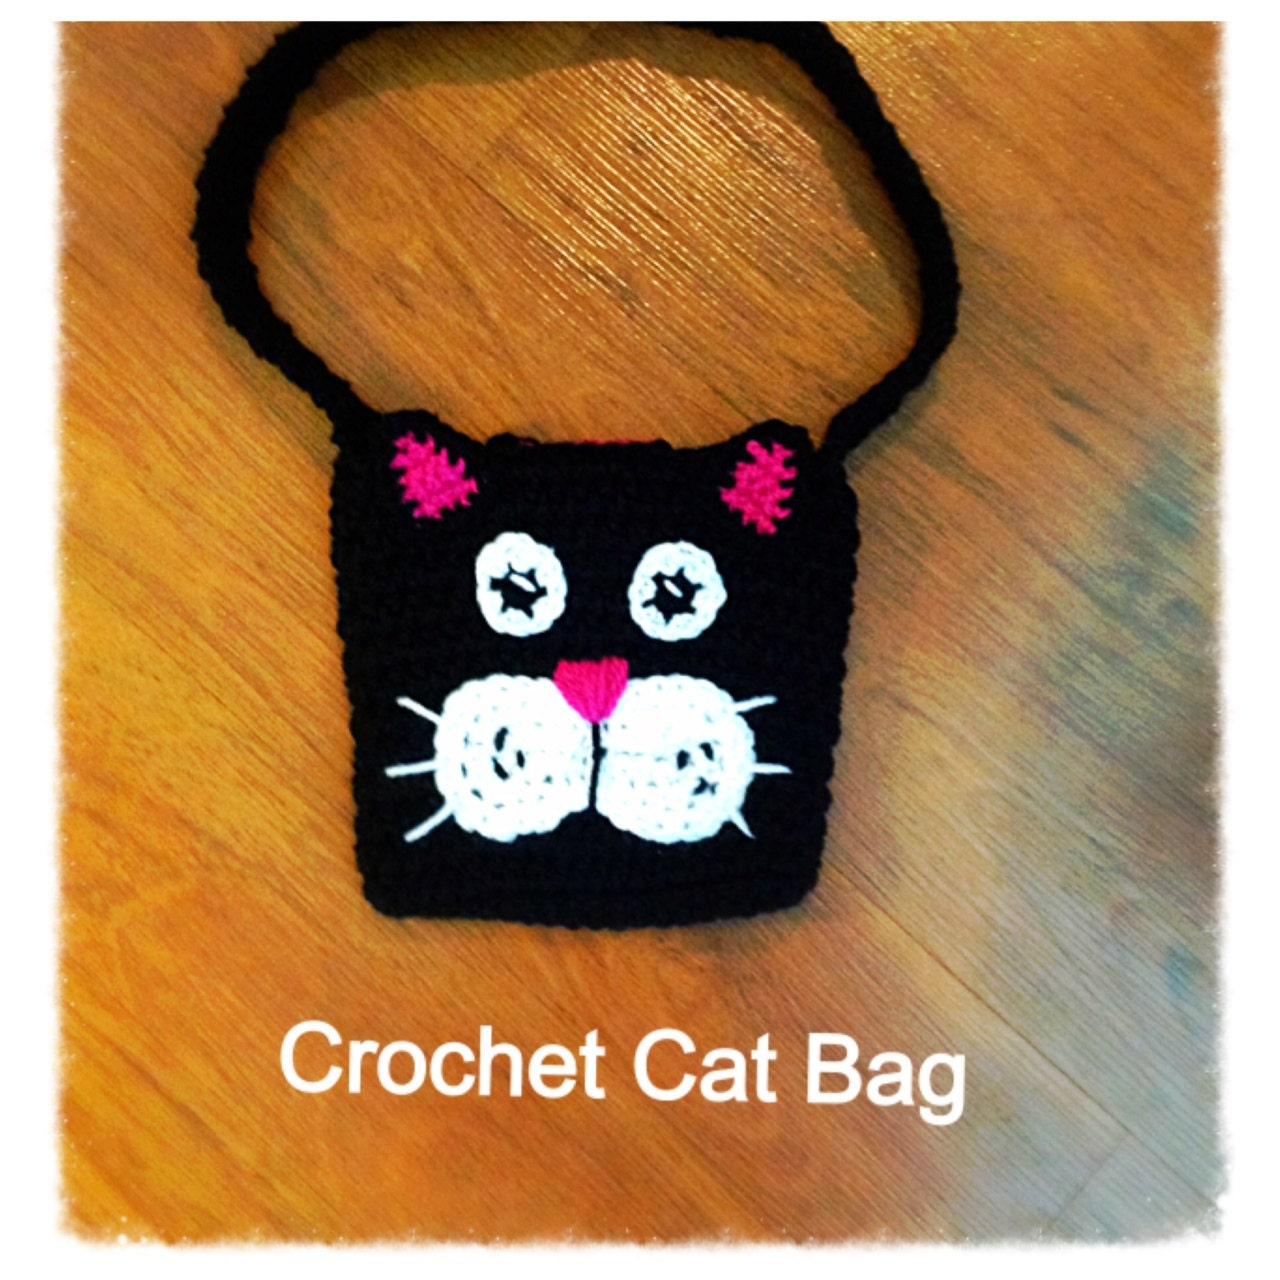 Crochet Grab Bag Pattern : Kids Crochet Cat Bag Pattern with Back Button Strap ...